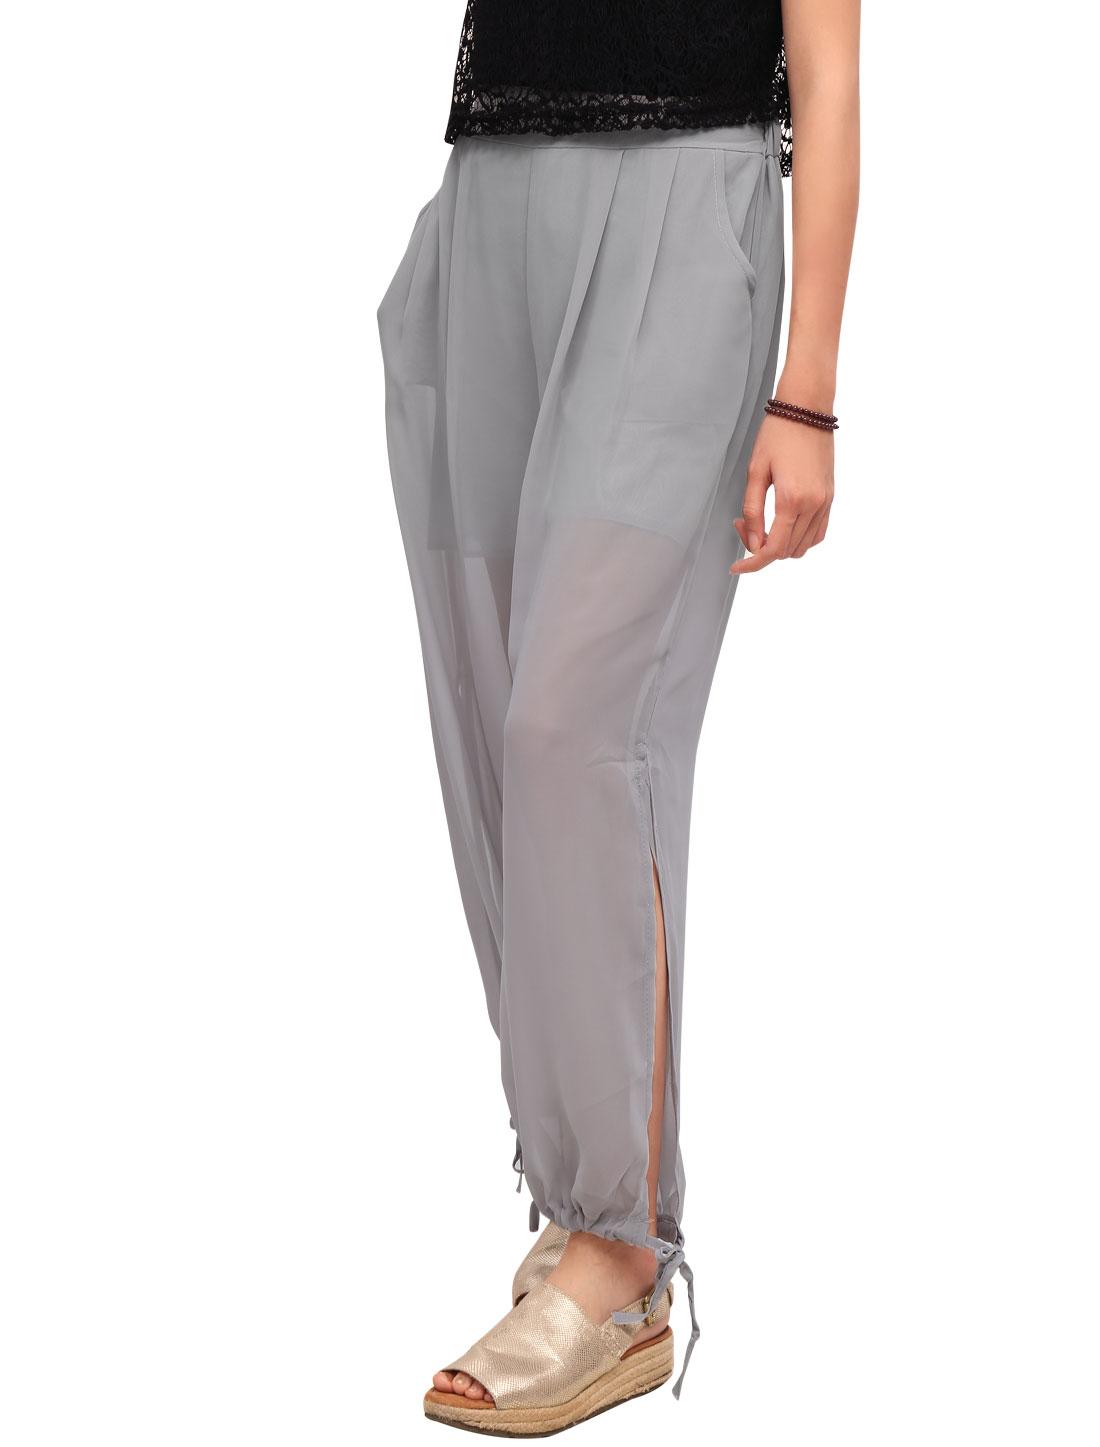 Women High Rise Semi Sheer Harem Pants Light Gray XS